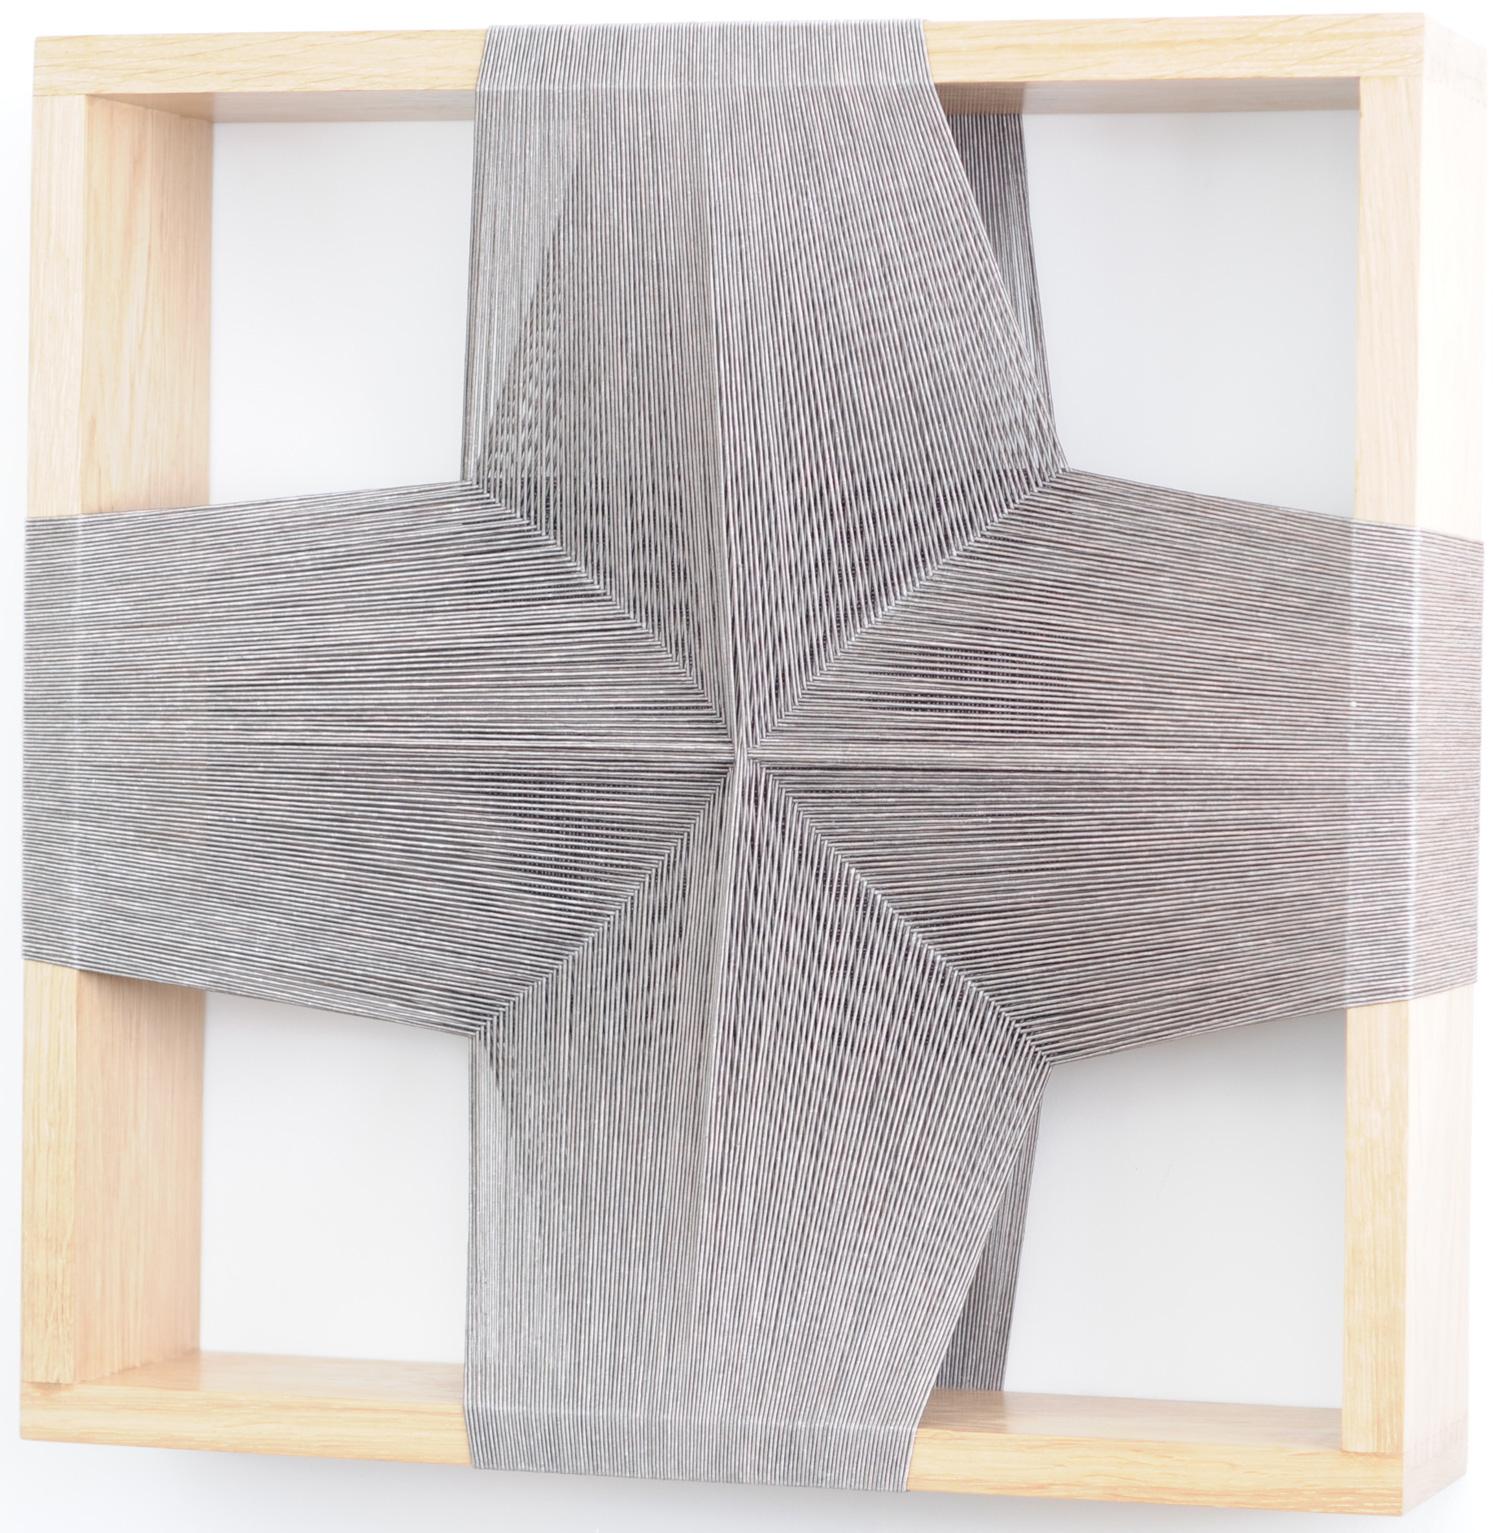 Maryrose Watson  'Feather Series 4', 2012  Cotton and viscose on European oak  50cm x 50cm x 12cm